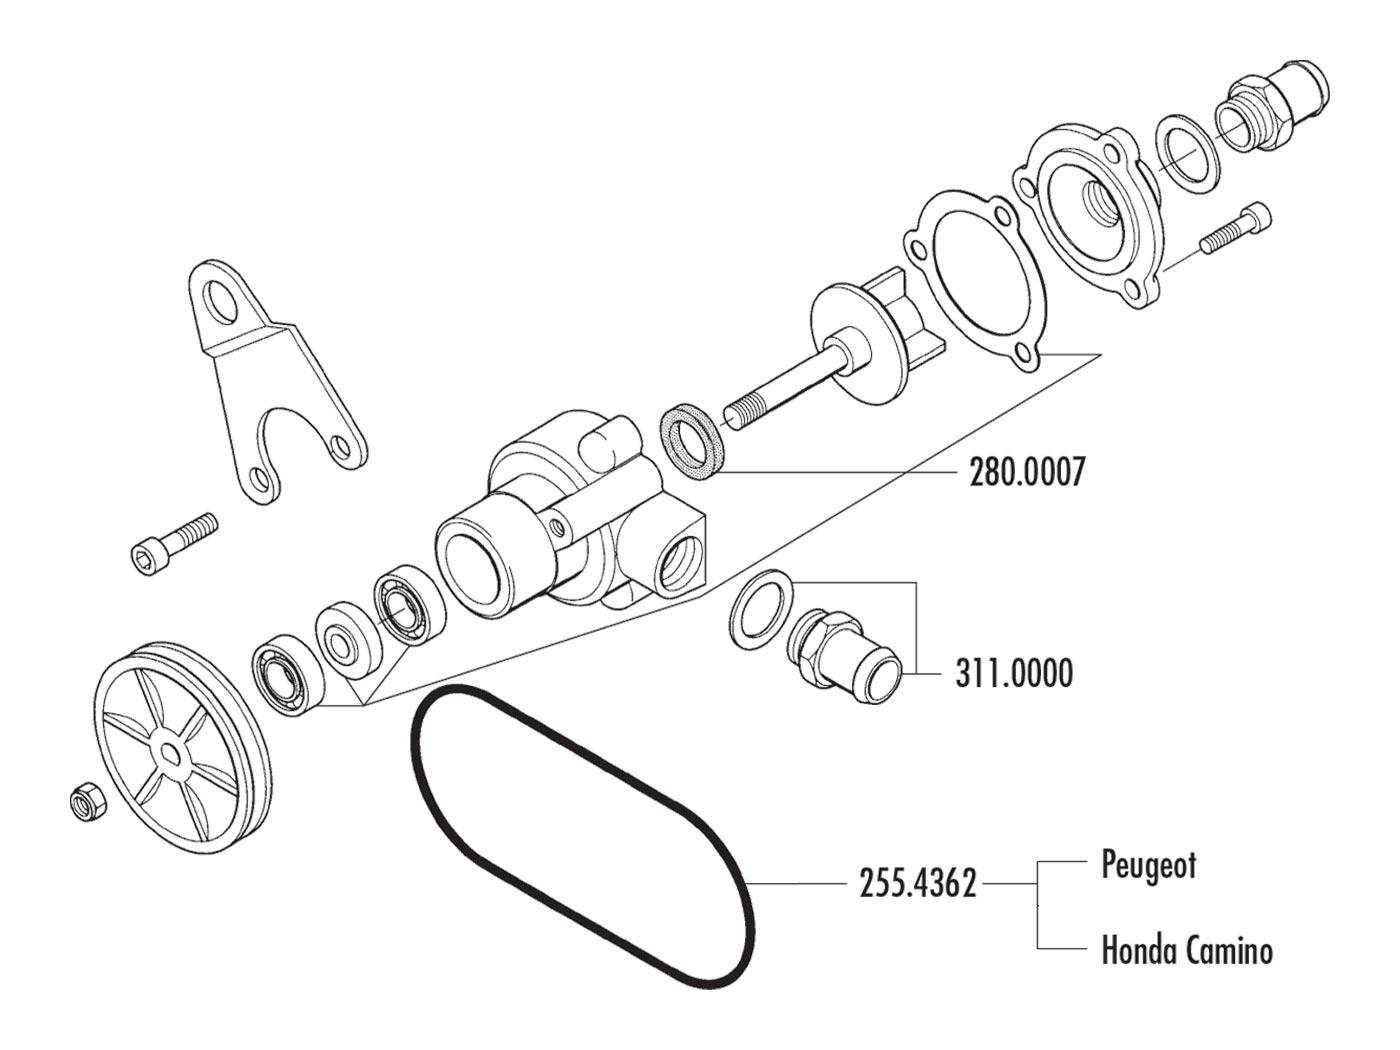 dinli 50 wiring diagram database Honda Motorcycle Wiring Diagrams dinli 50 wiring diagram database dinli 502 parts dinli 50